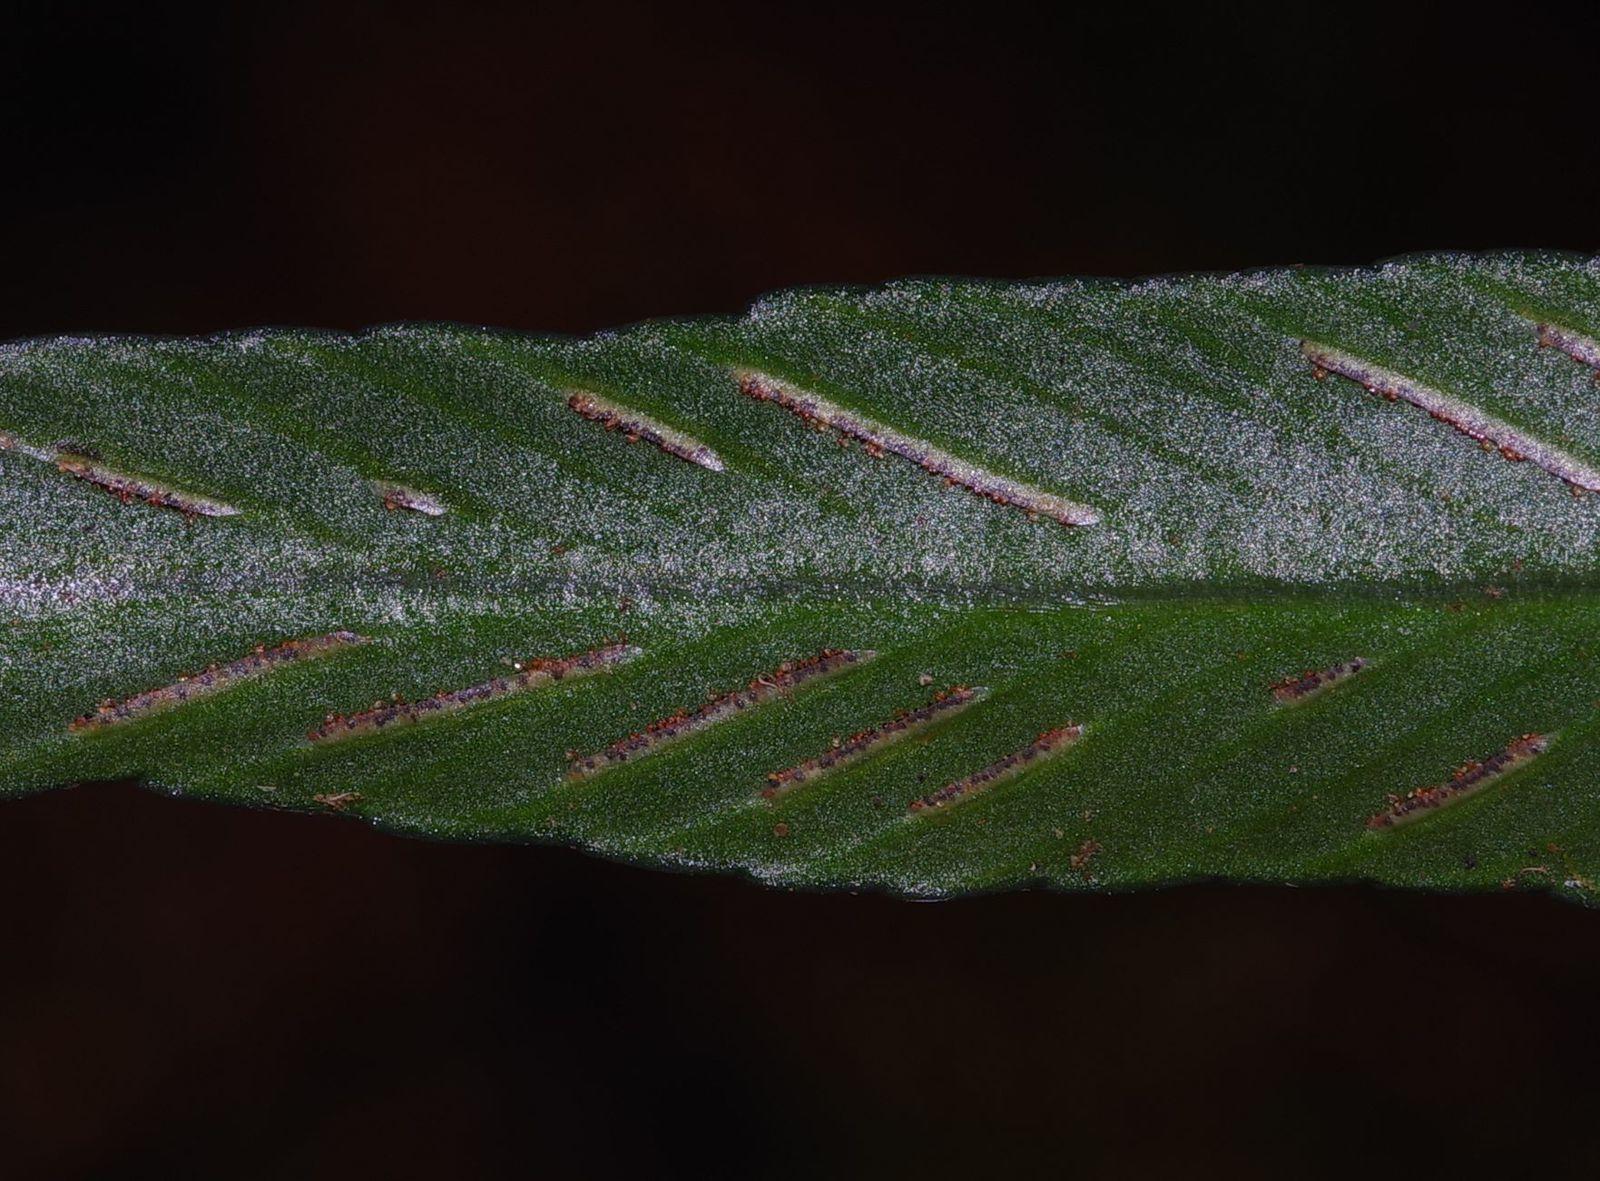 Asplenium angustum